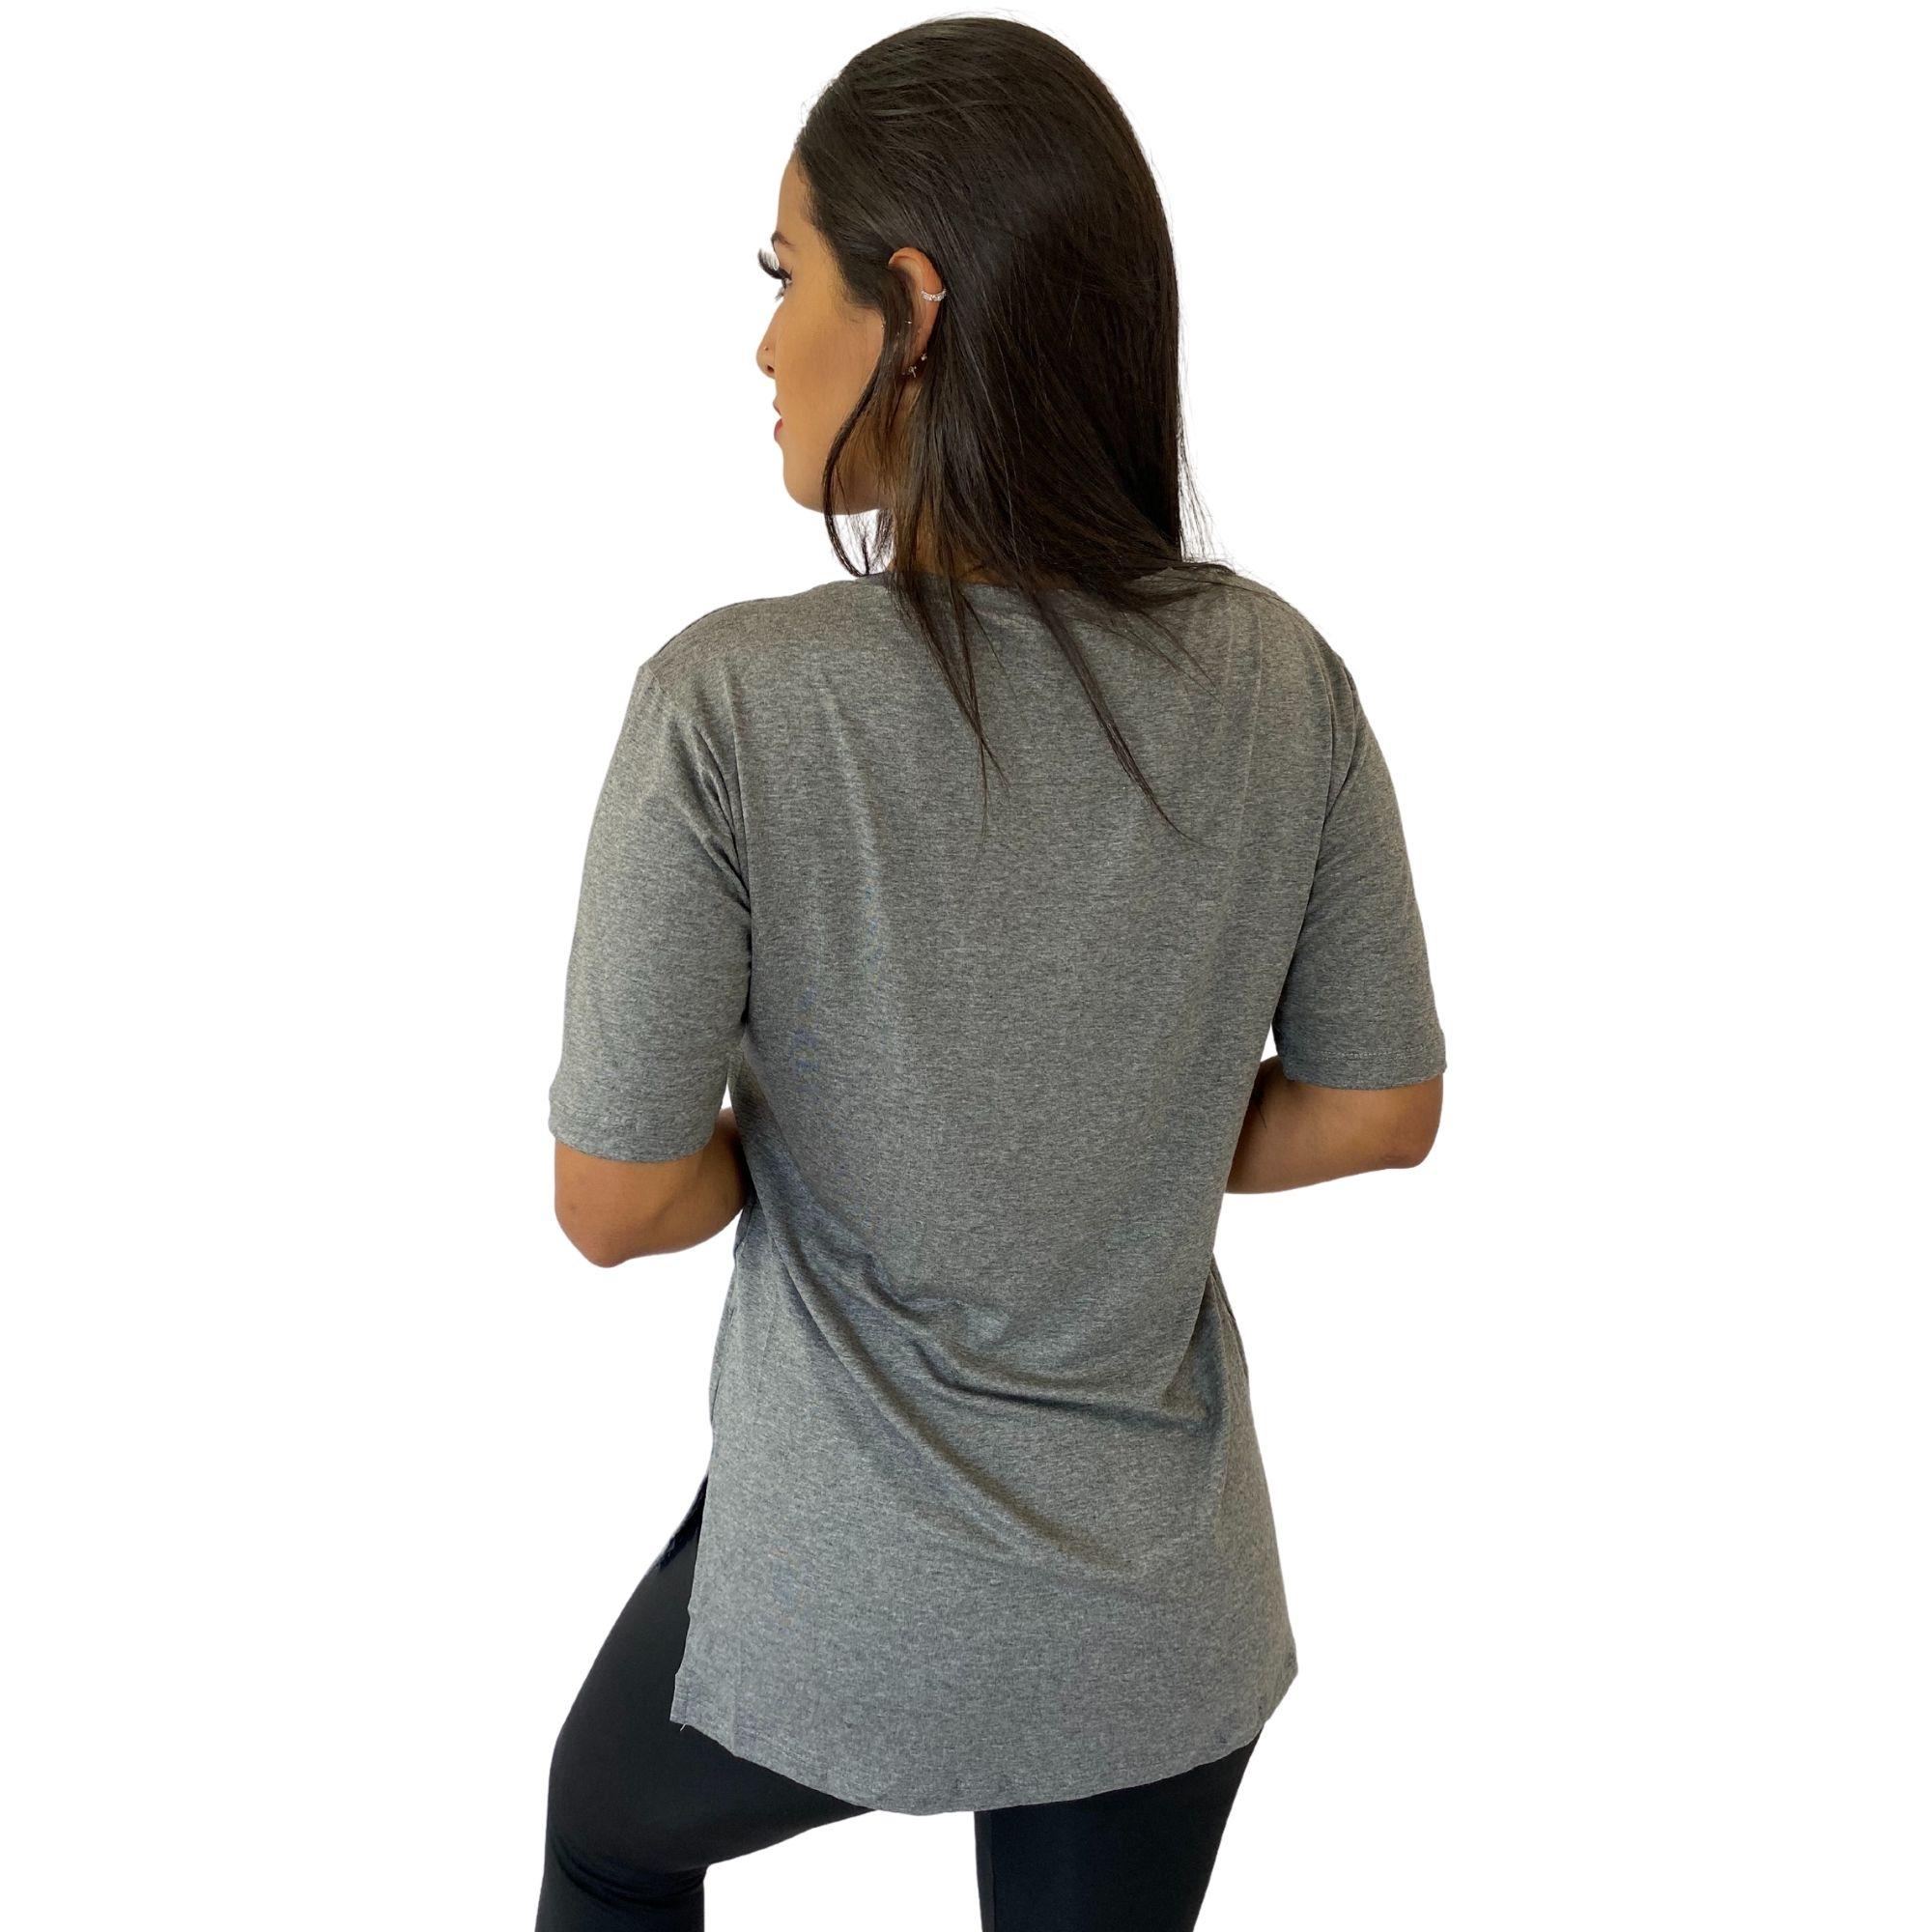 Camiseta Feminina Tapa Bumbum Manga Curta Cinza